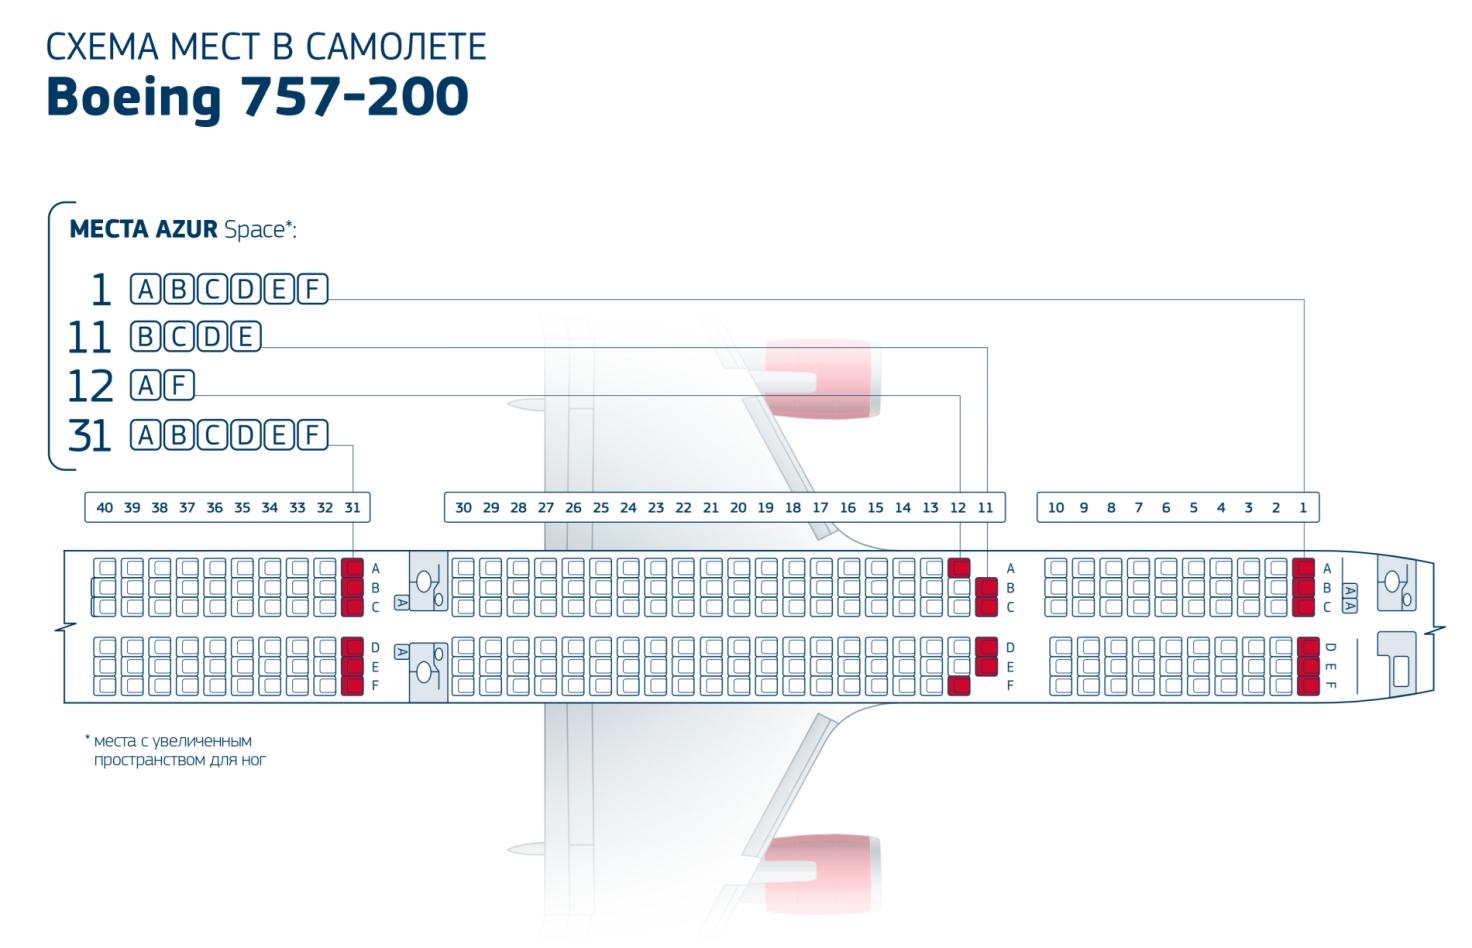 Боинг 757-200 — схема салона и лучшие места роял флайт.